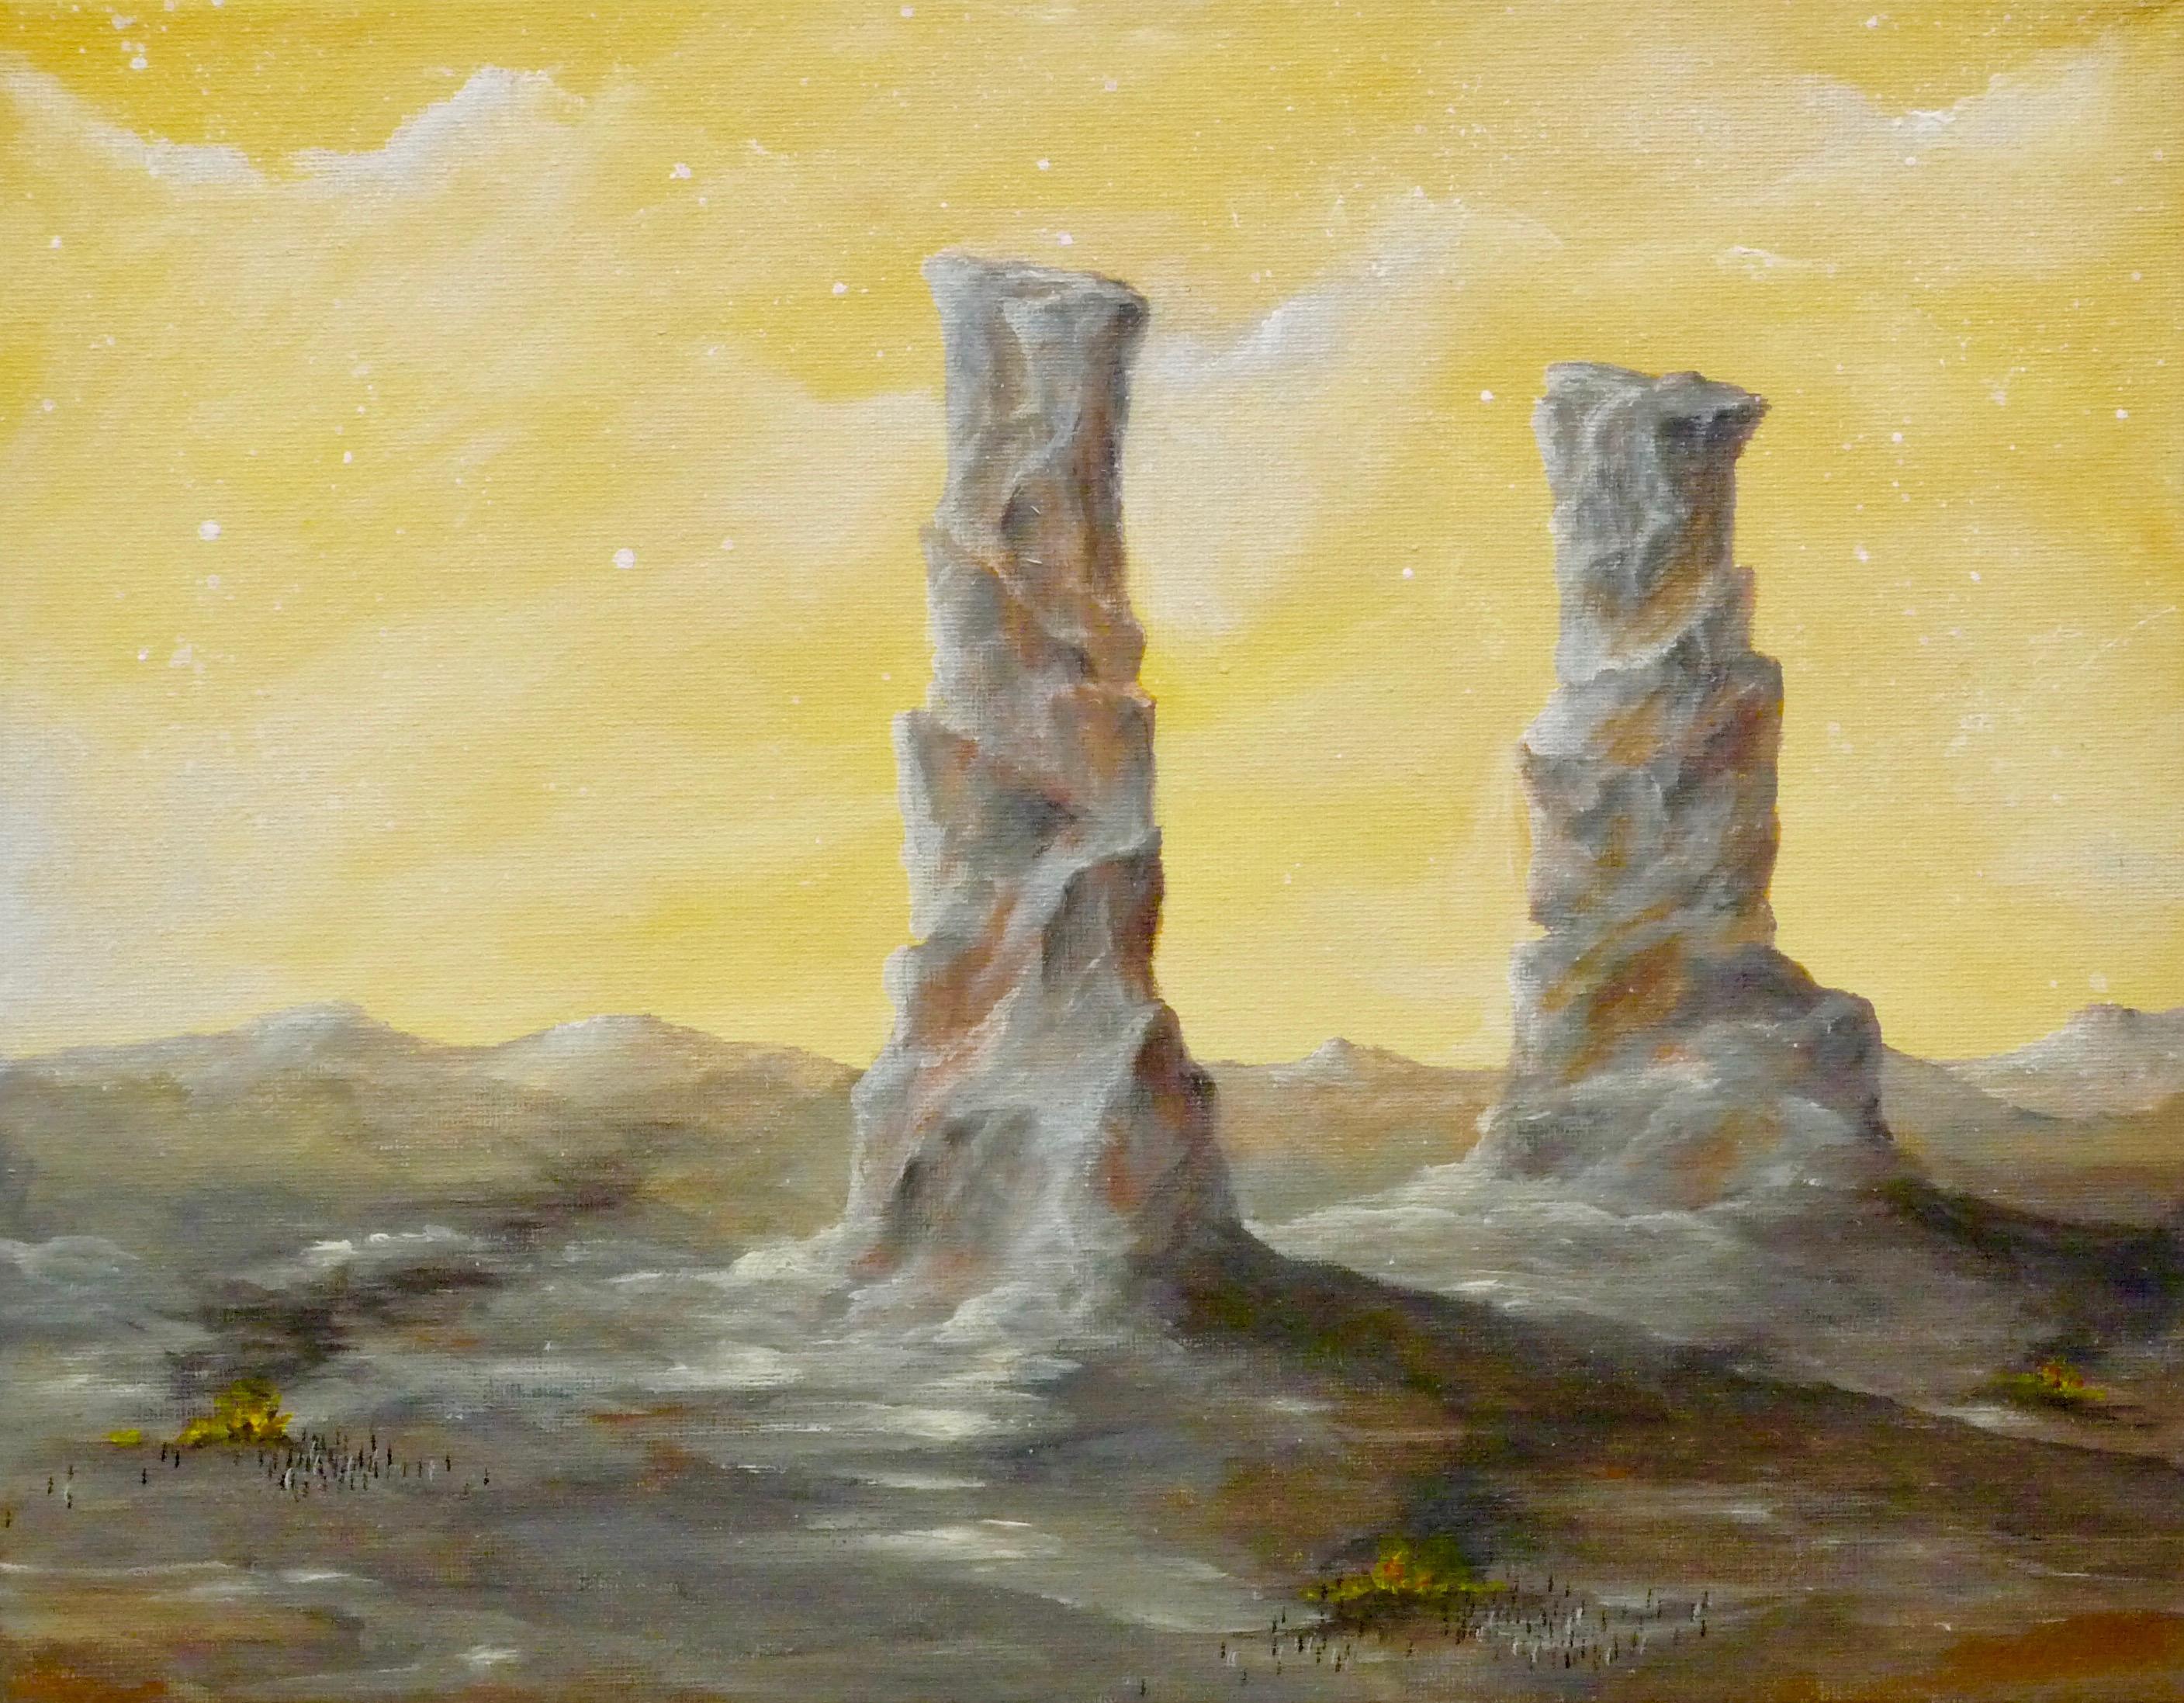 Singing Towers of Darillium